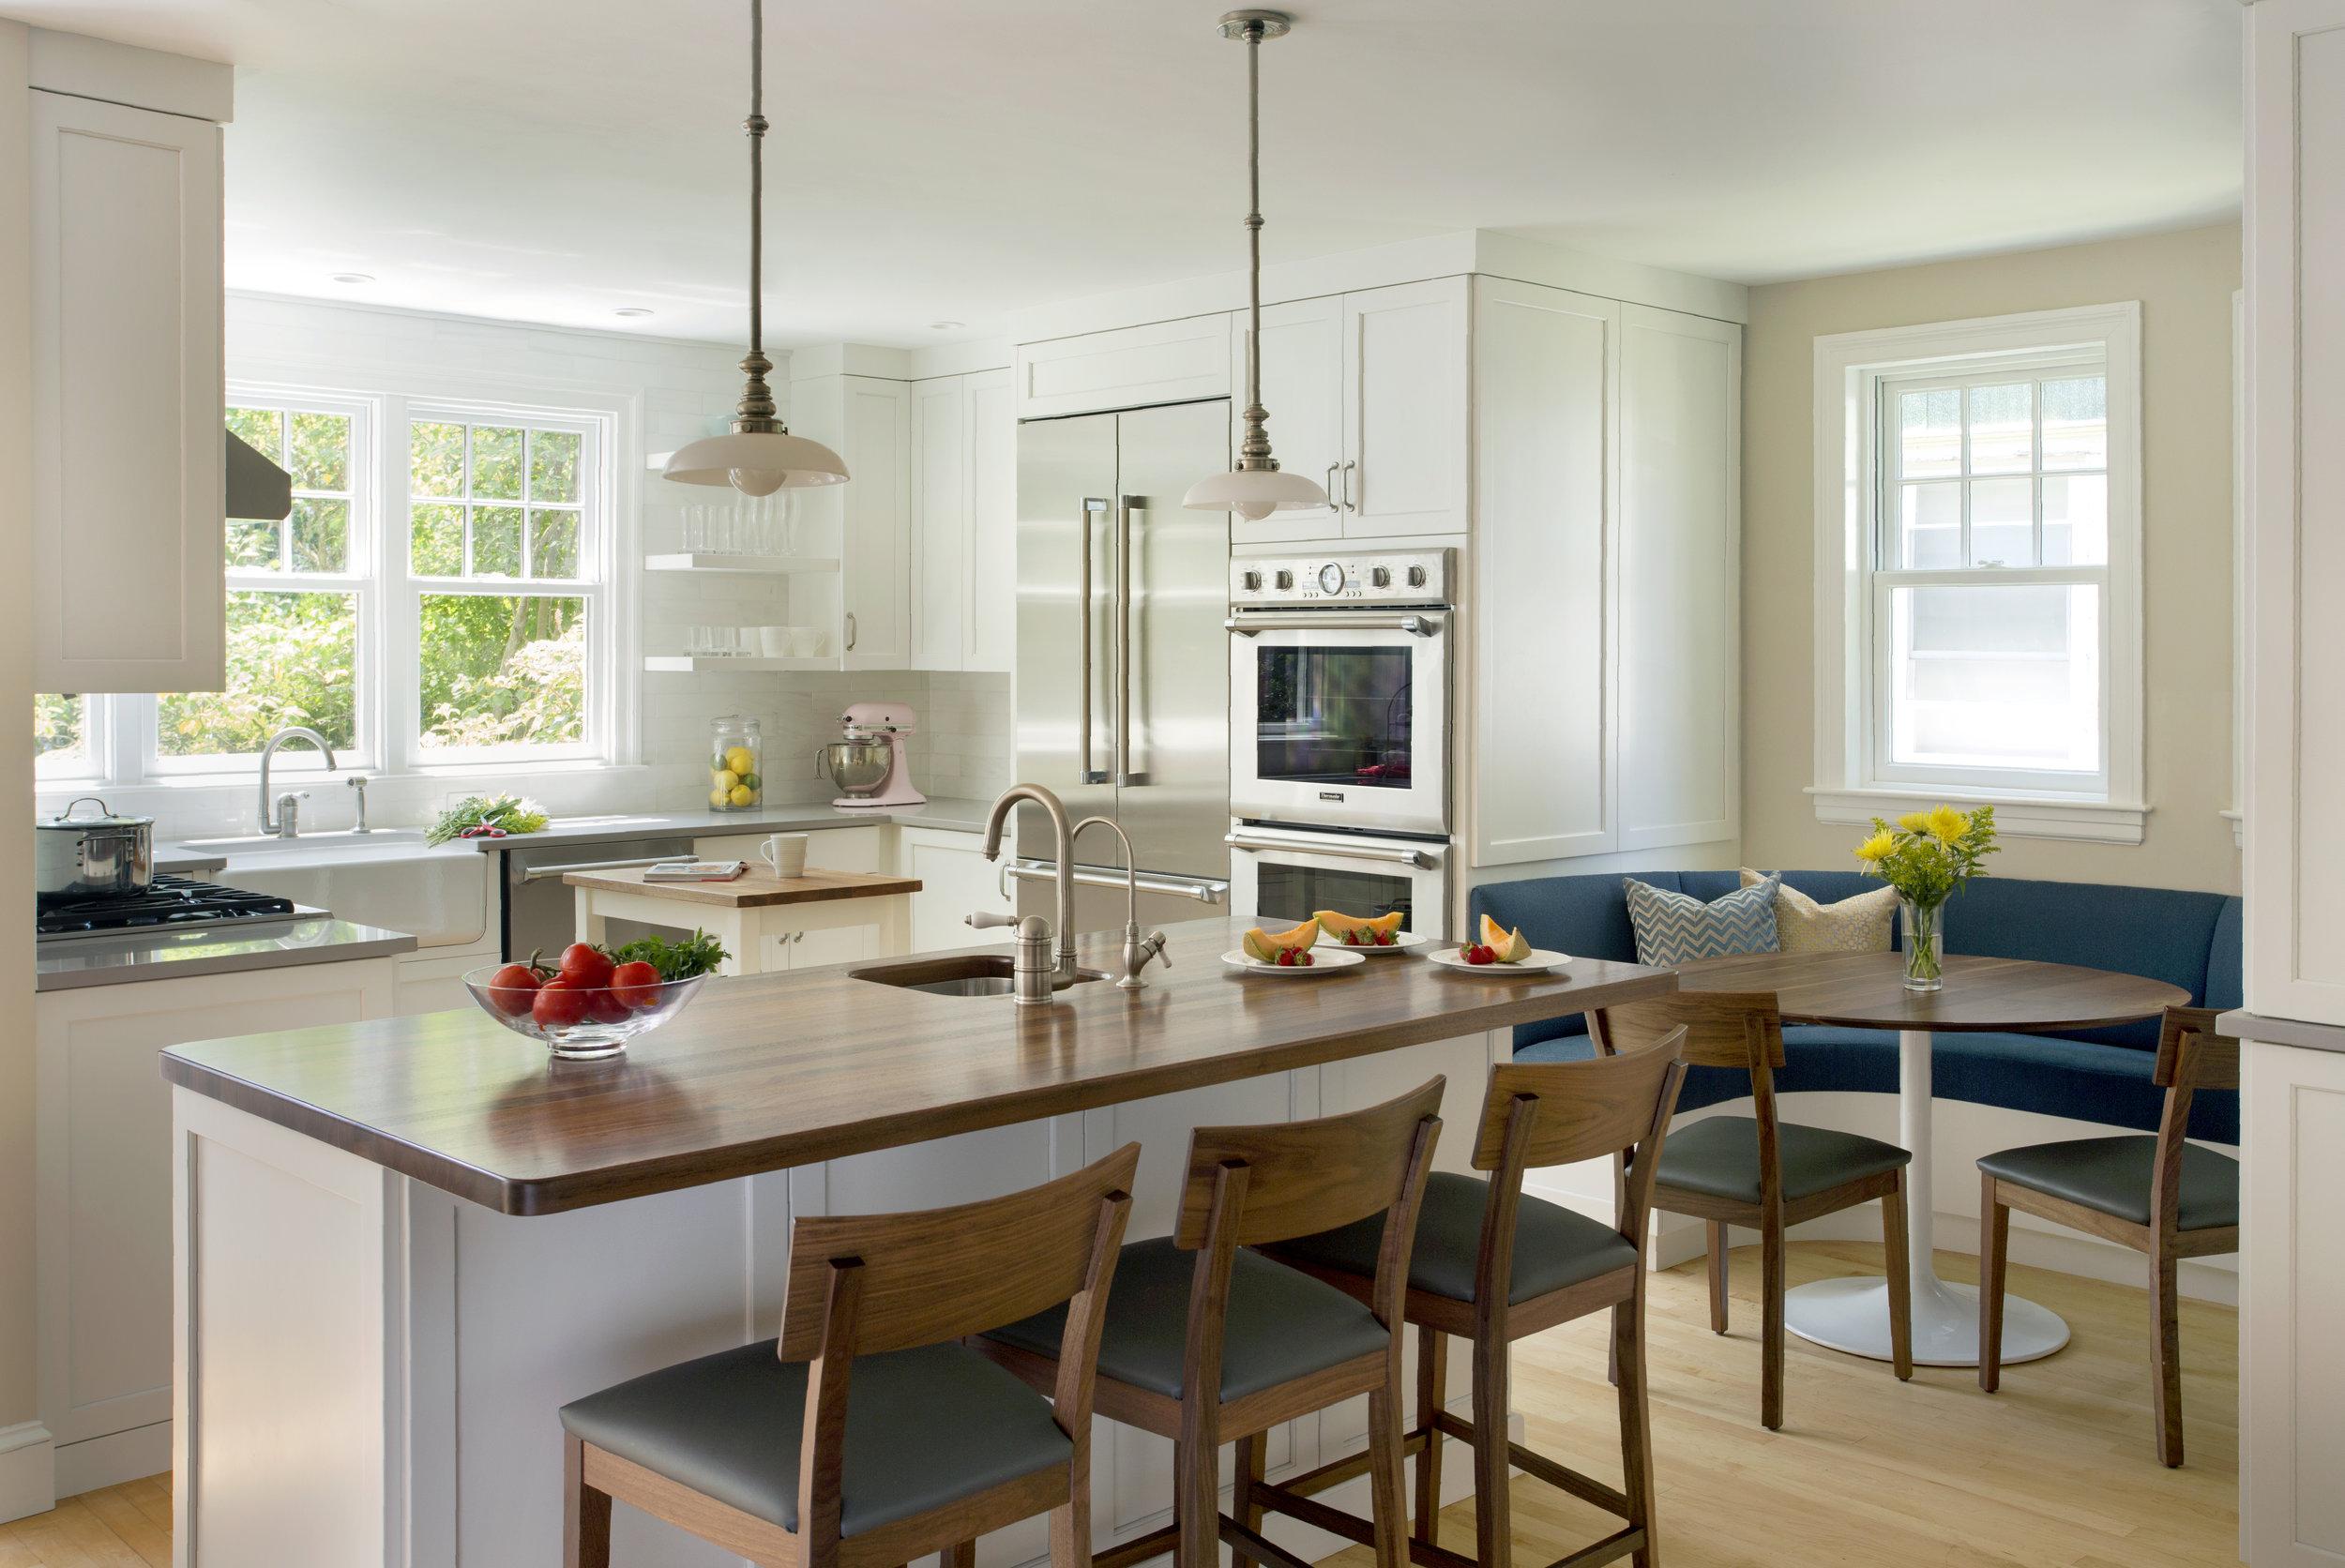 Jeff Swanson 6 14 kitchen 1 - Copy.jpg